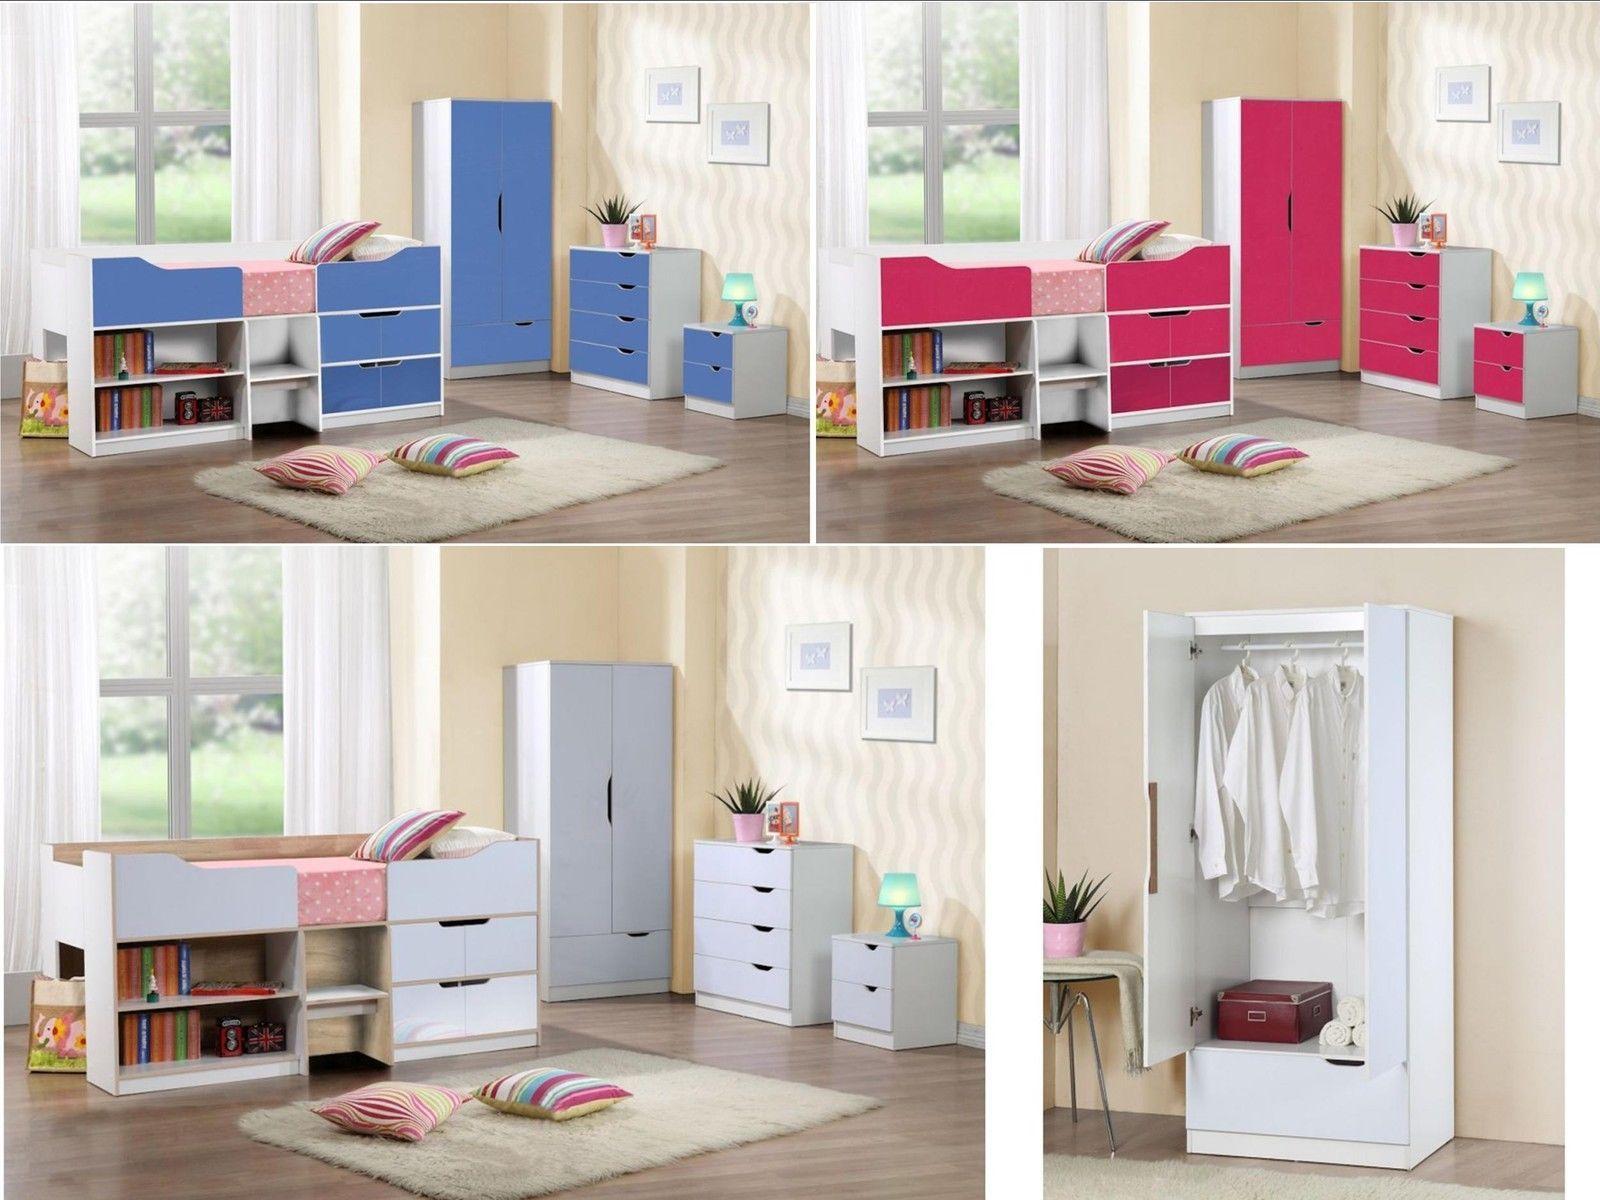 birlea paddington childrens gloss bedroom furniture white oak